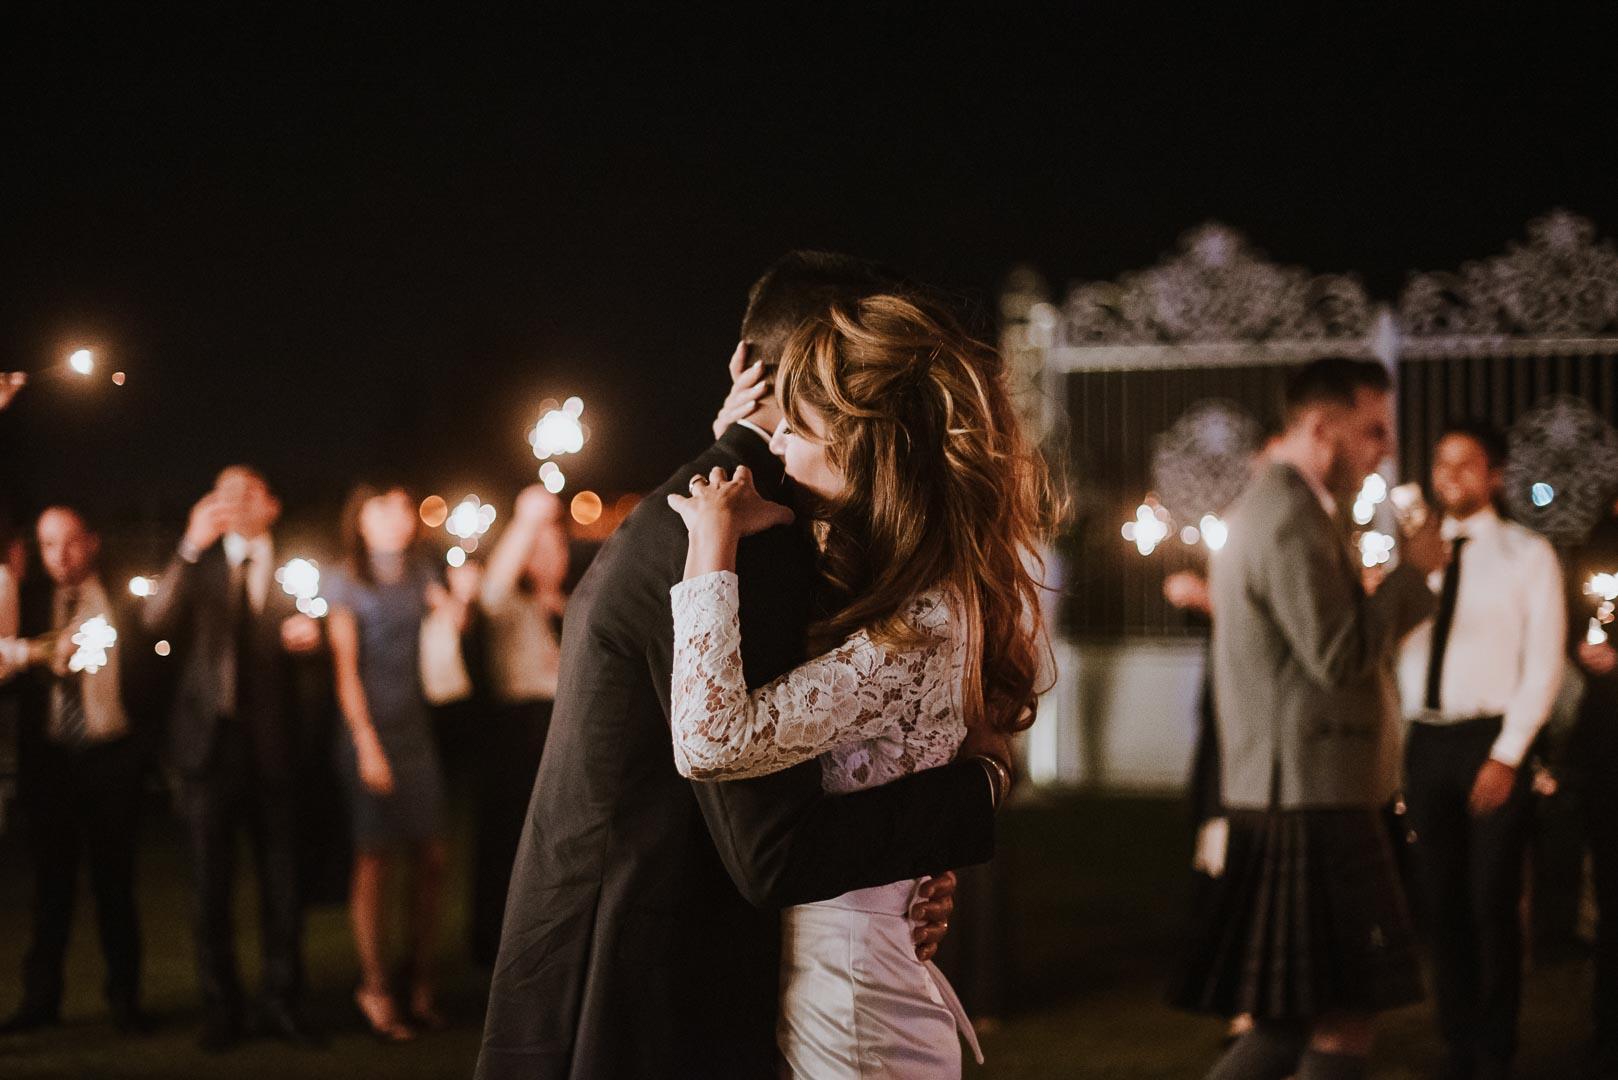 wedding-photographer-destination-fineart-bespoke-reportage-napoli-nabilah-vivianeizzo-spazio46-196